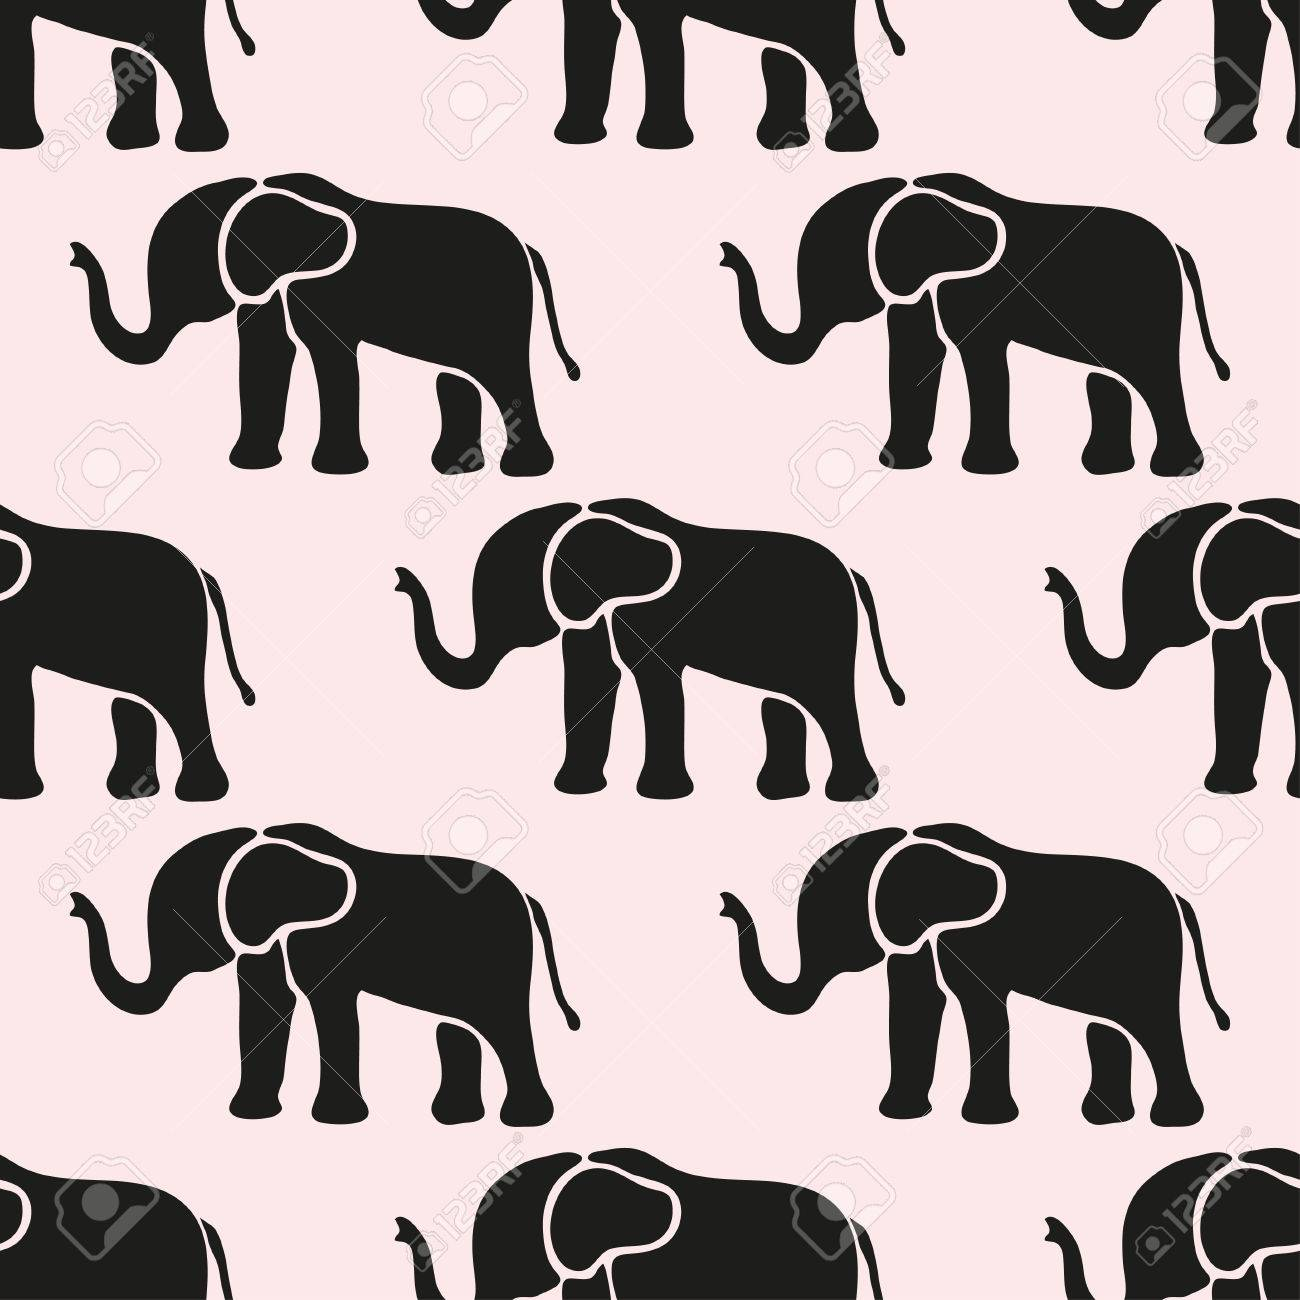 Elegant Seamless Pattern With Abstract Elephant Symbols Design